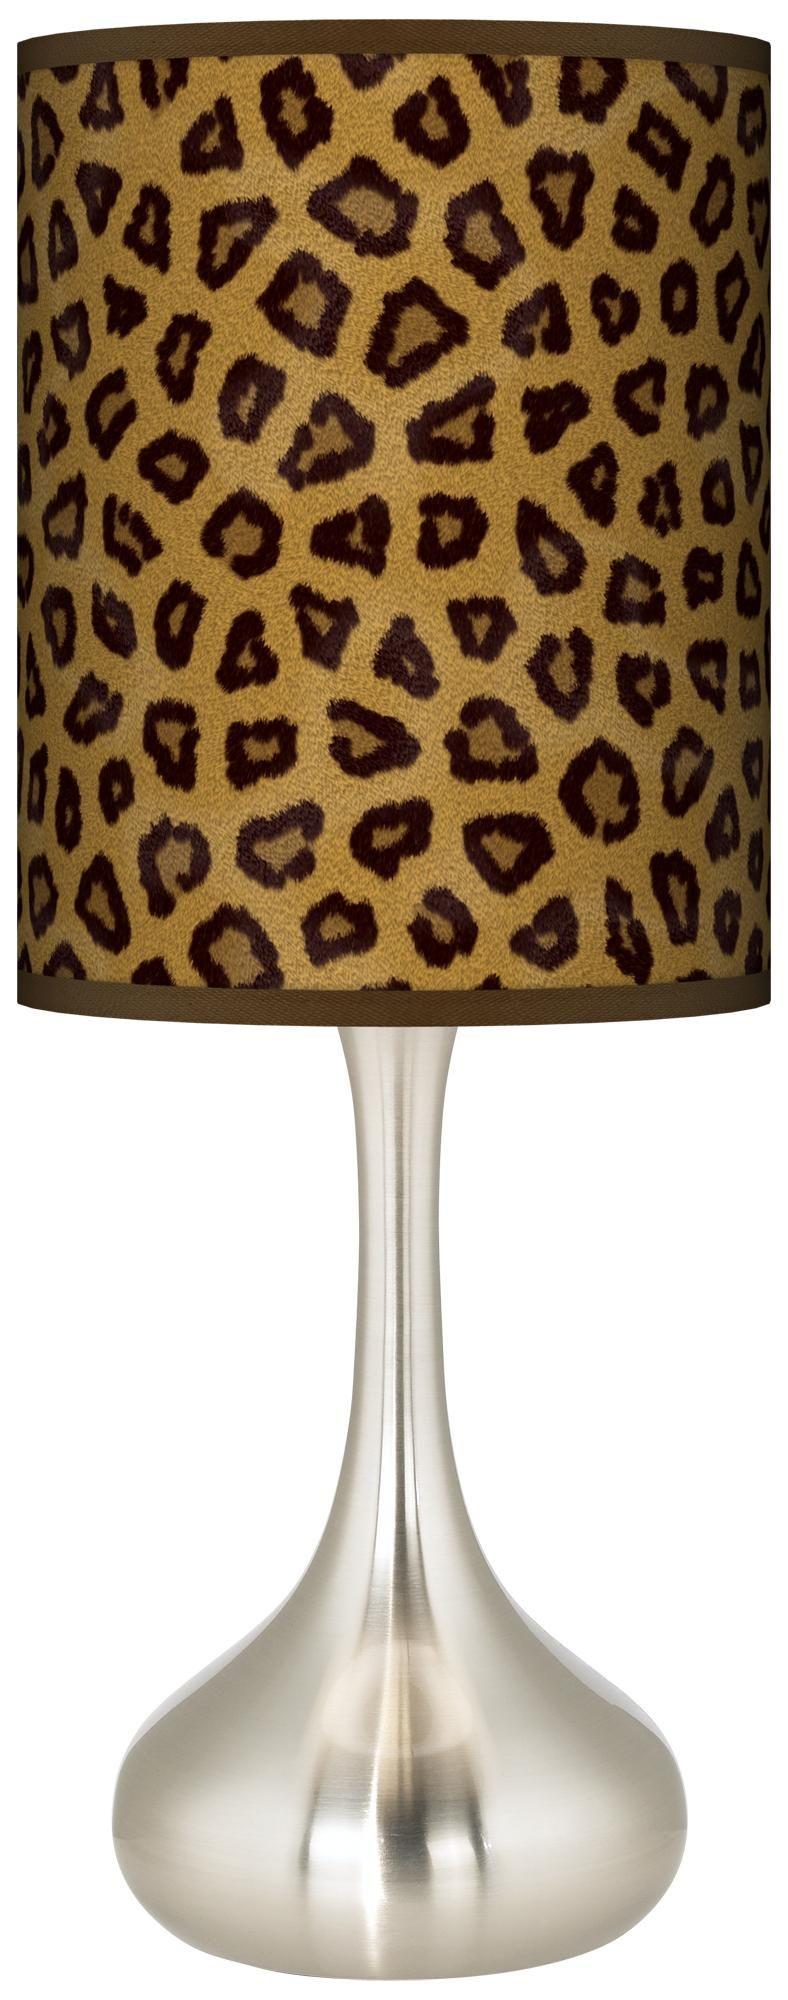 Safari cheetah giclee droplet table lamp cheetahs safari and safari cheetah giclee droplet table lamp geotapseo Image collections